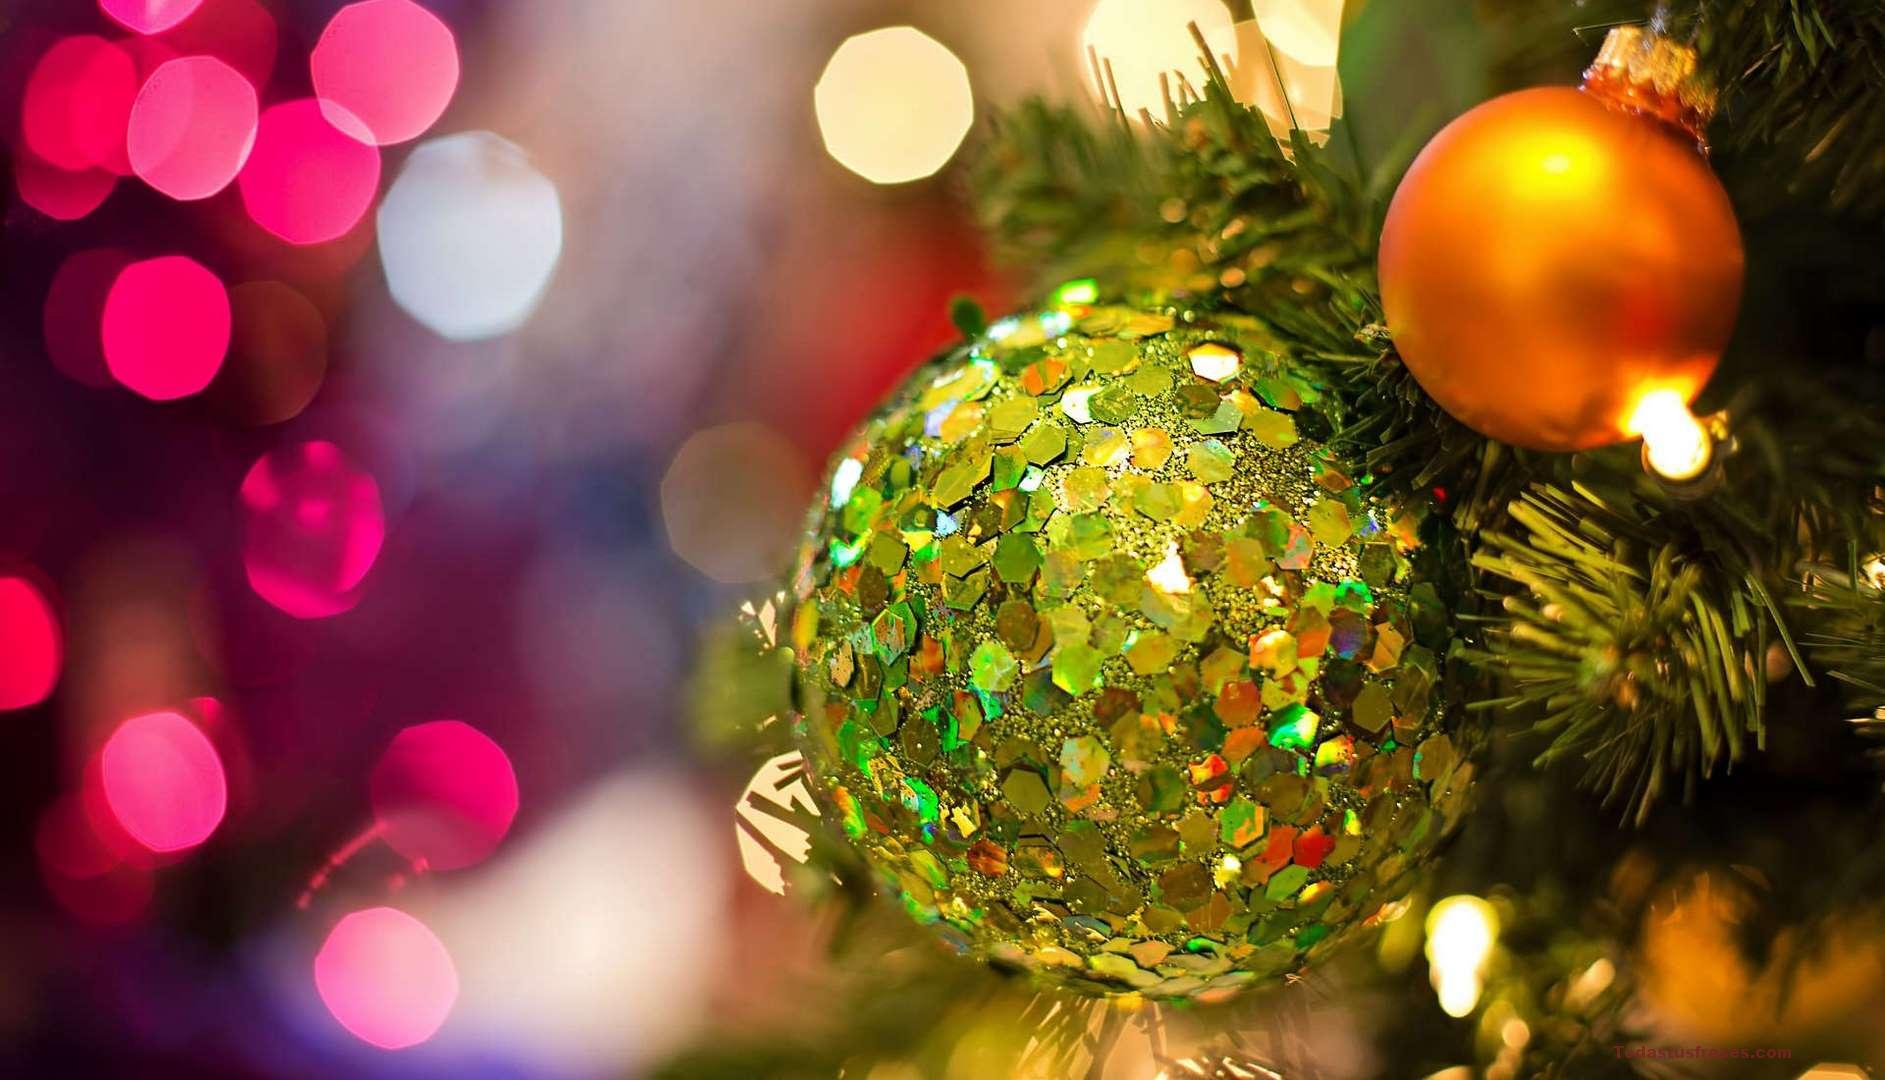 Tumblr Fondos De Pantalla De Navidad: Fondos De Pantalla De Navidad